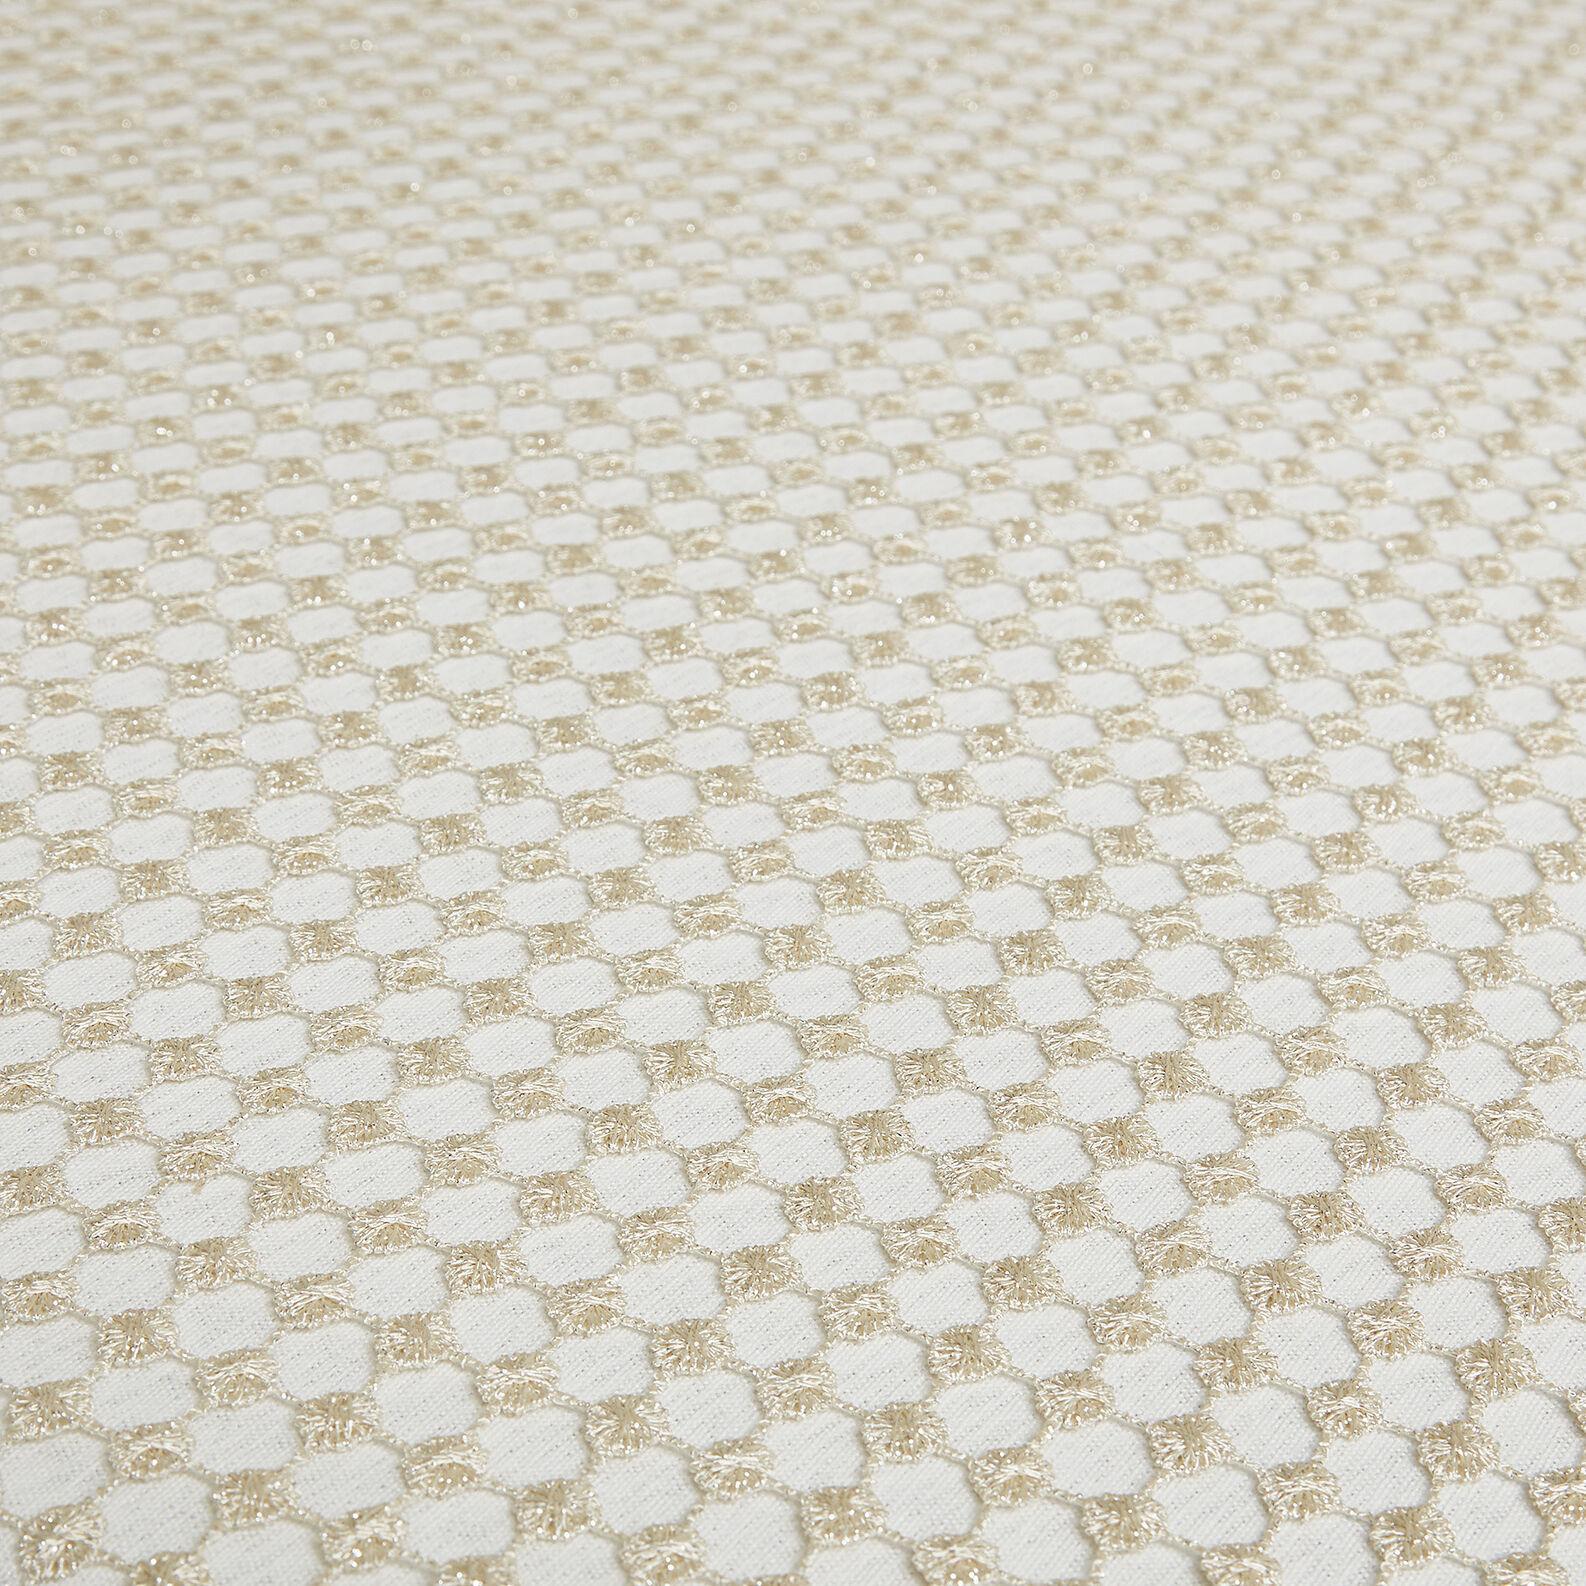 Openwork centrepiece with geometric weave